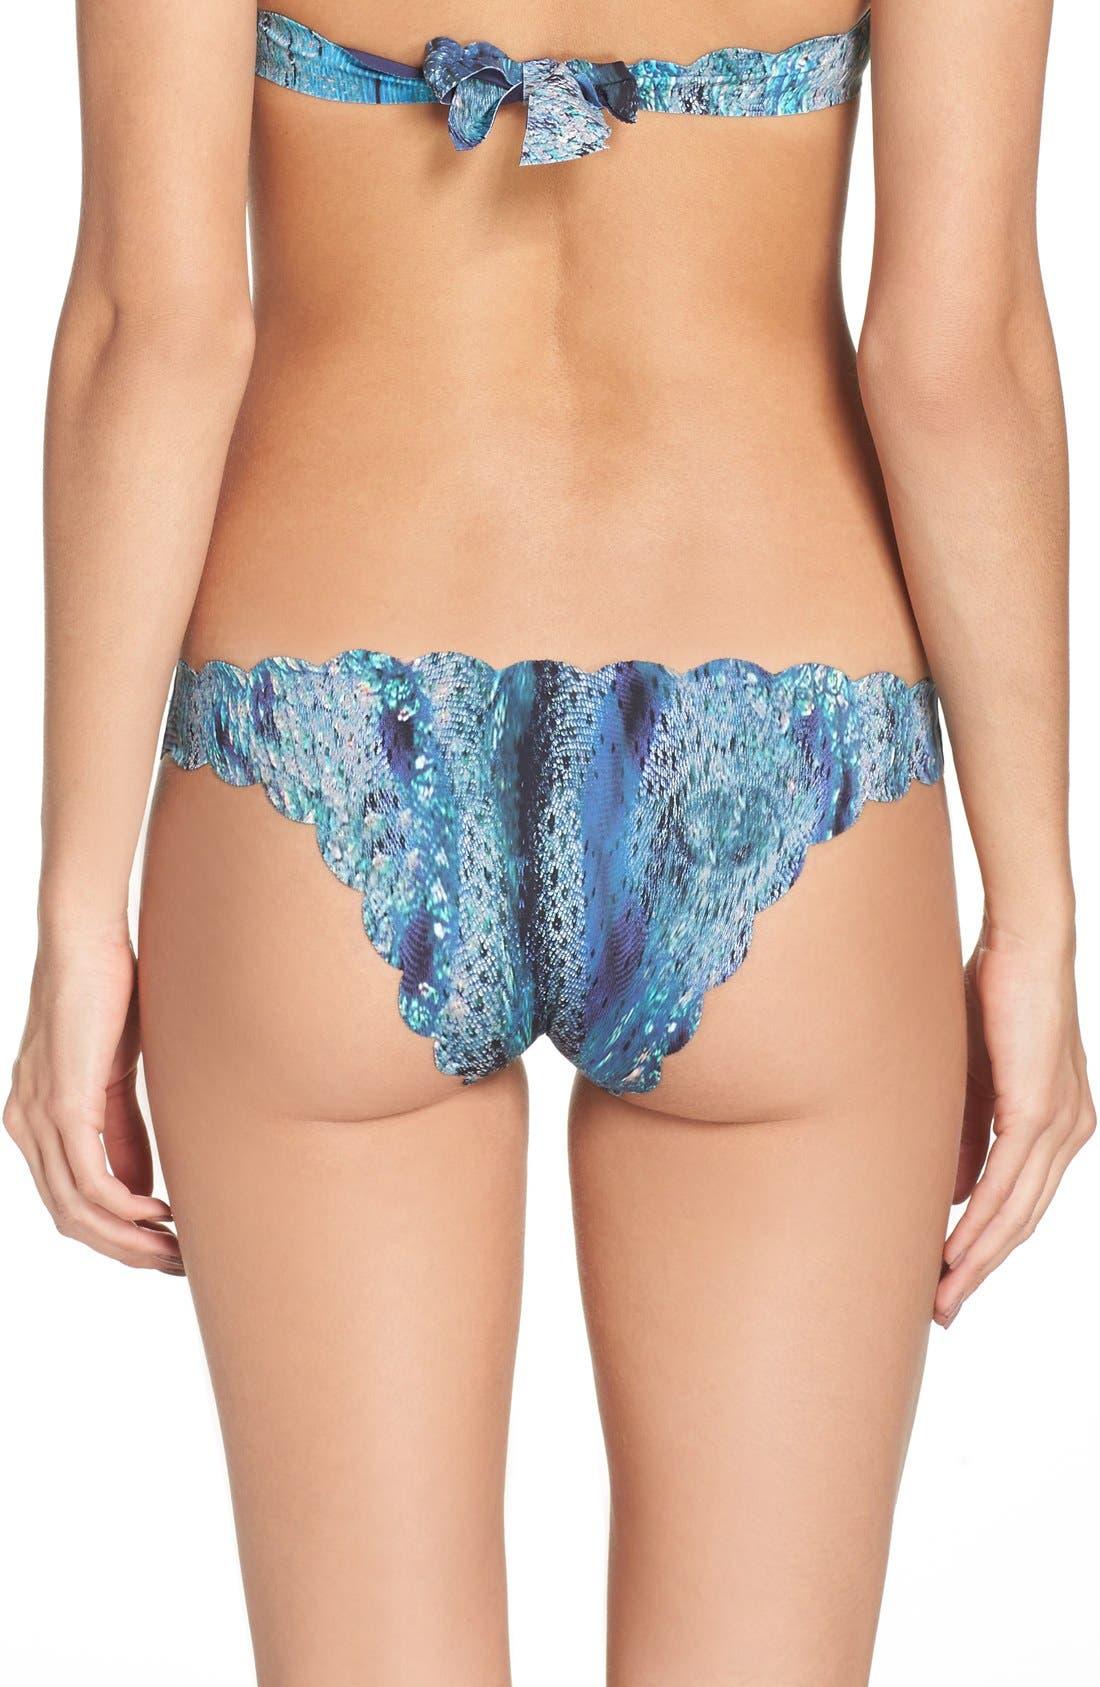 Alternate Image 1 Selected - PilyQ Seamless Reversible Bikini Bottoms